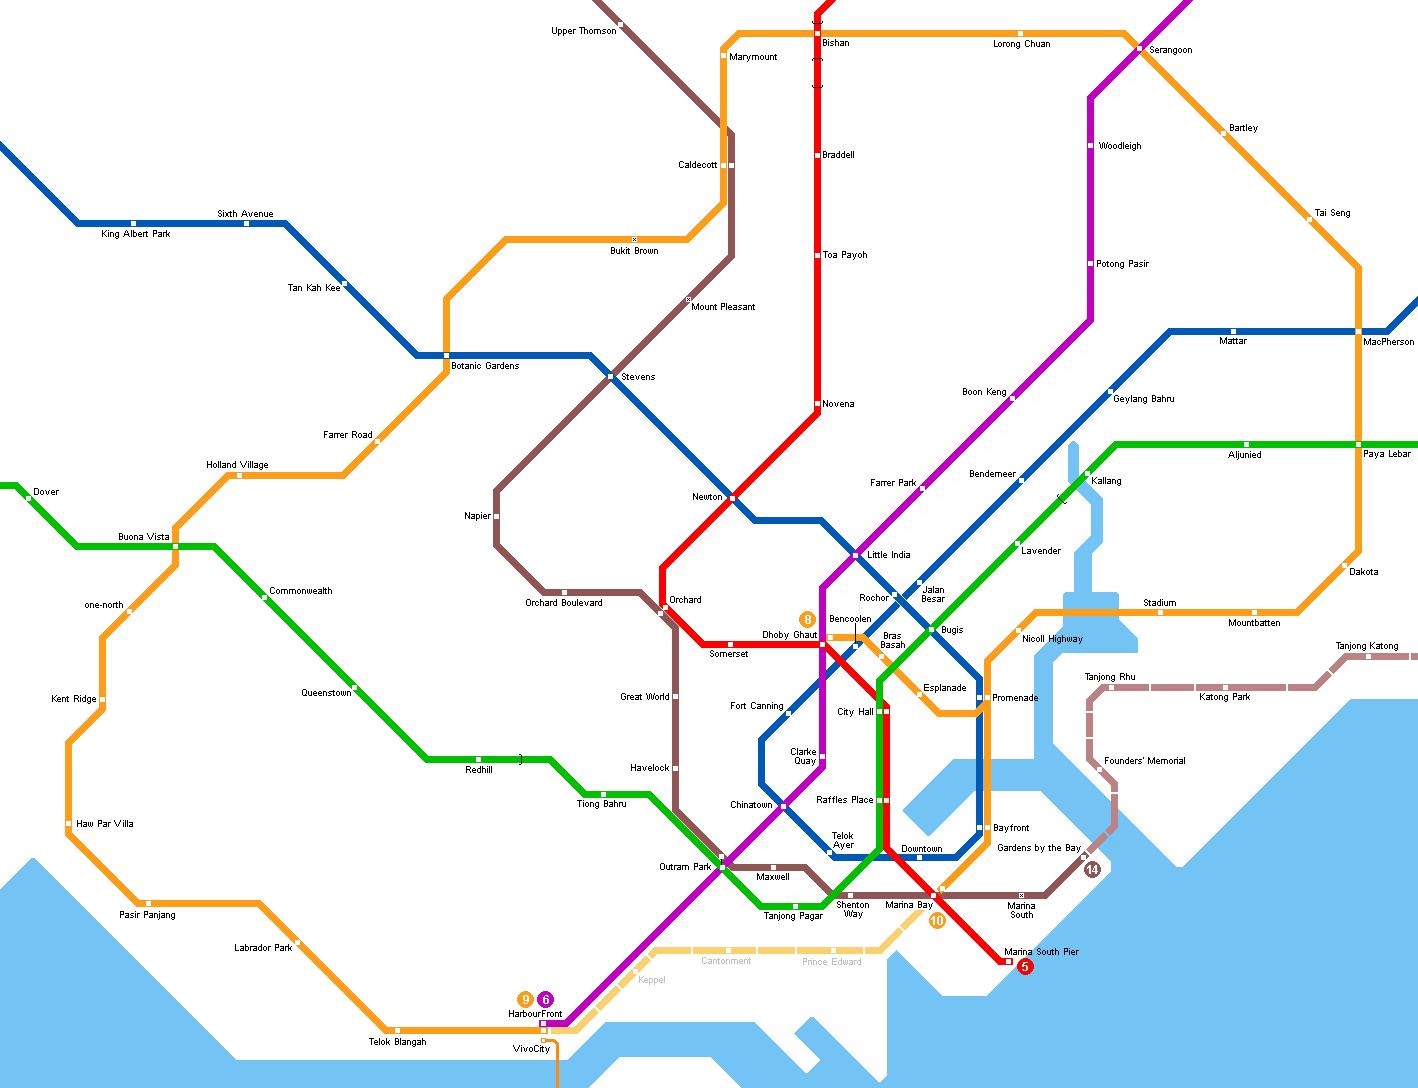 Mrt map singapore 2019